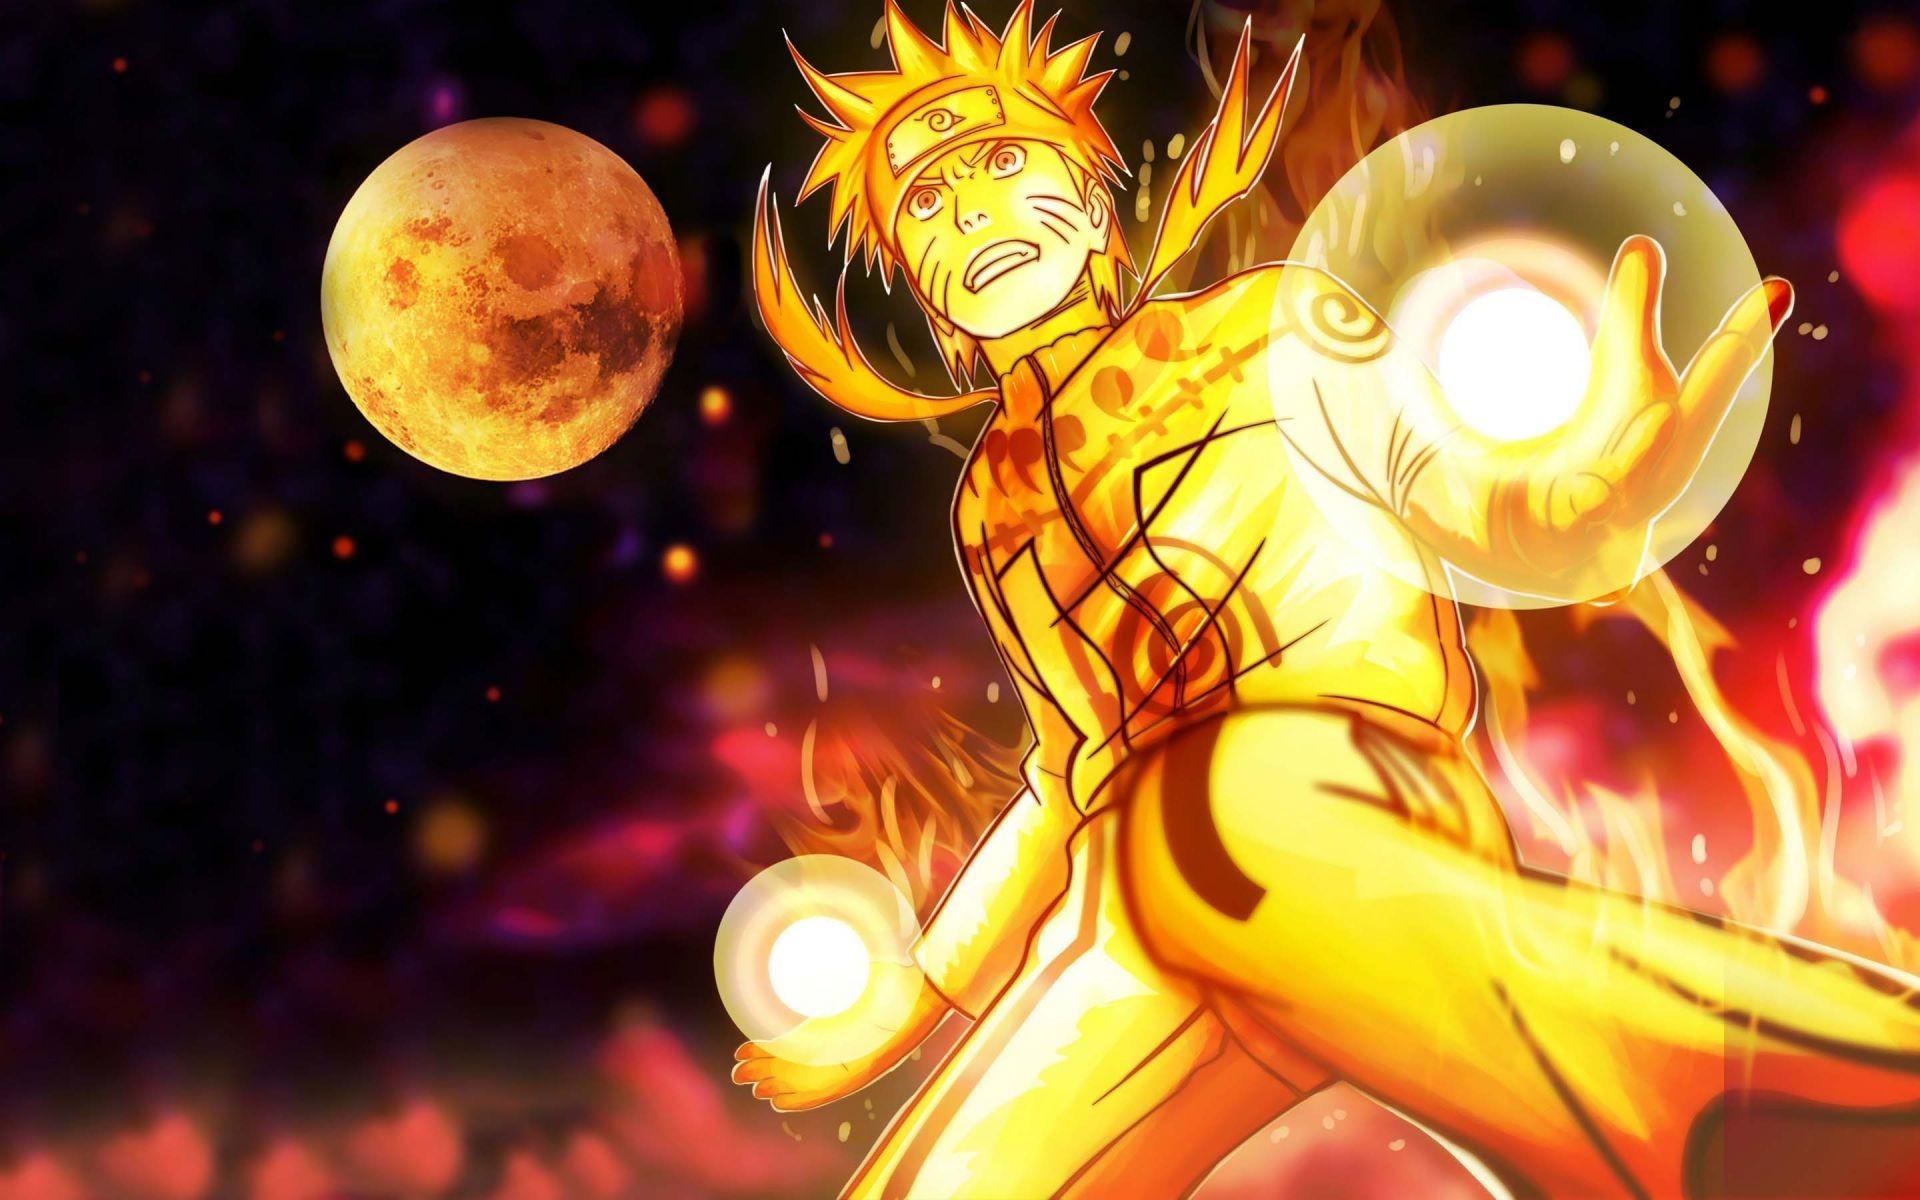 Naruto Fight Wallpaper | HD Anime Wallpaper Free Download …